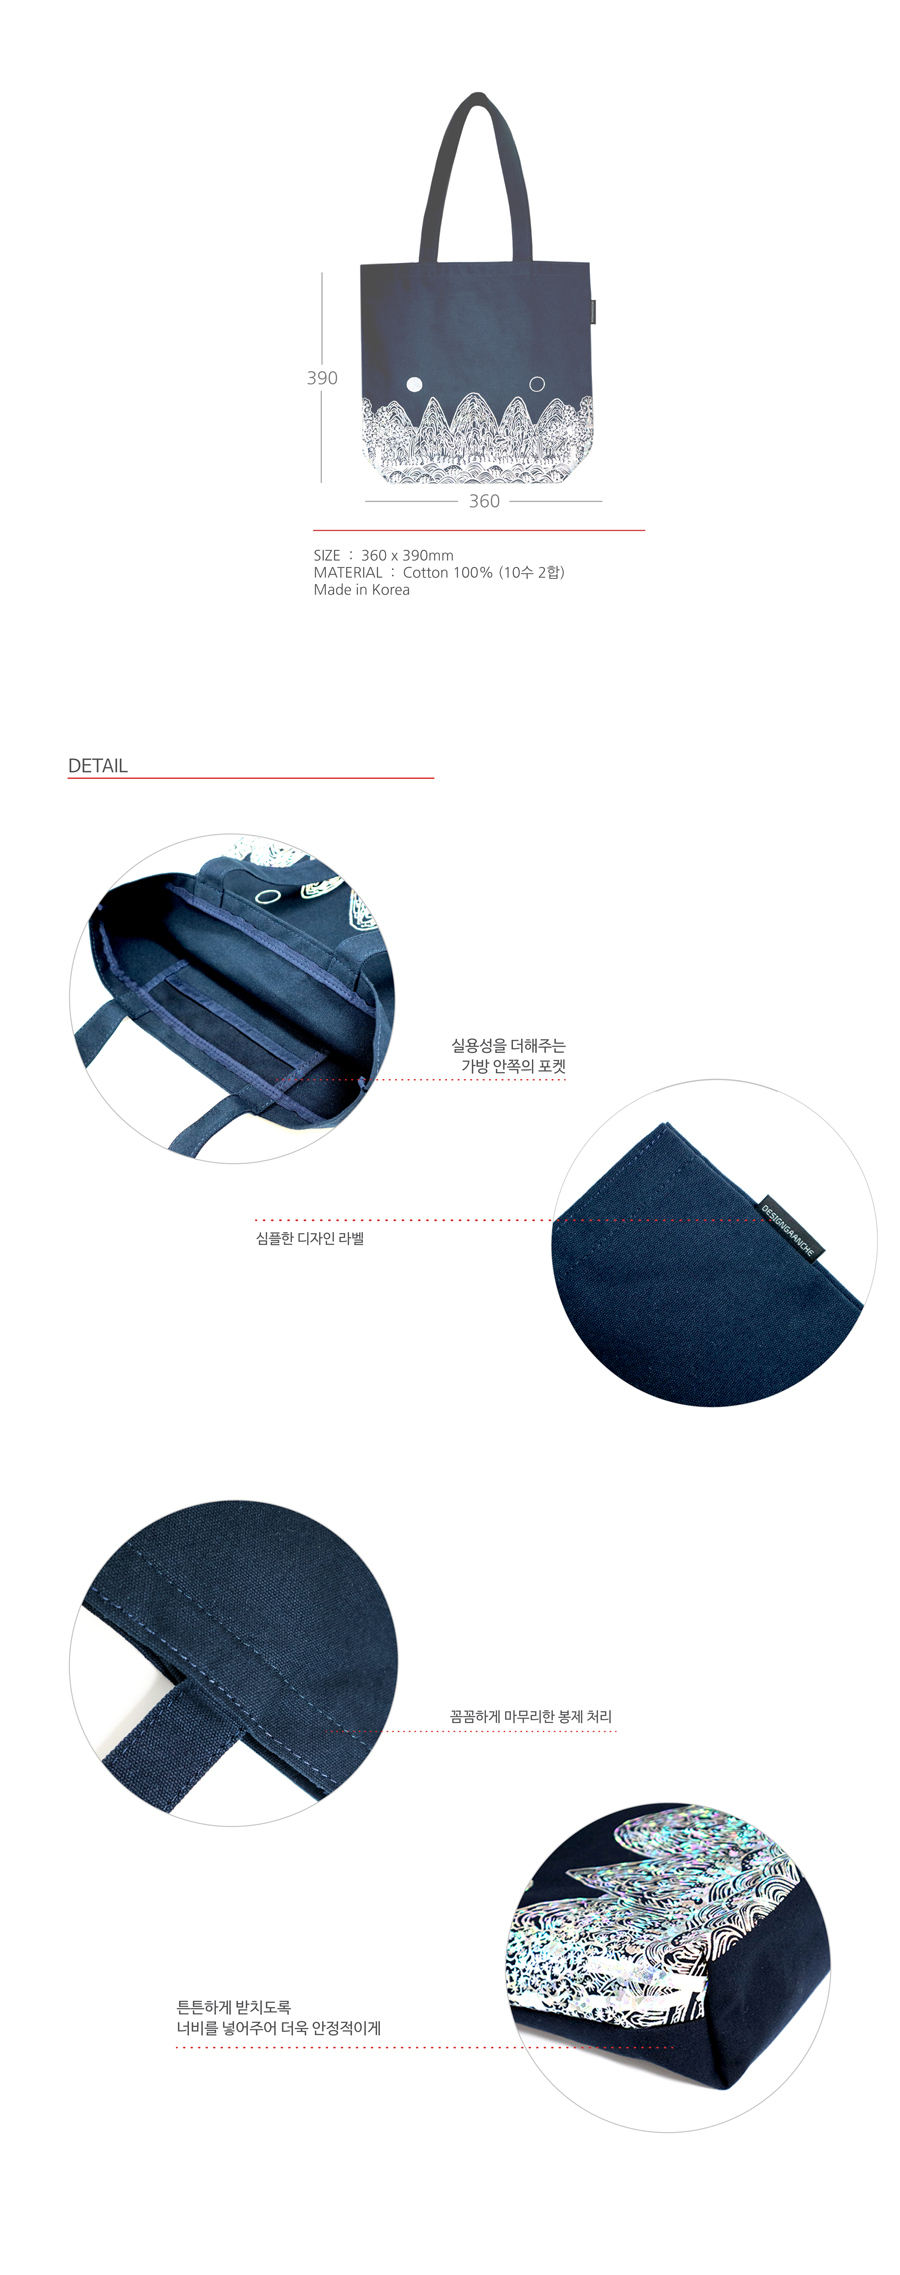 eco-il-detail-02.jpg